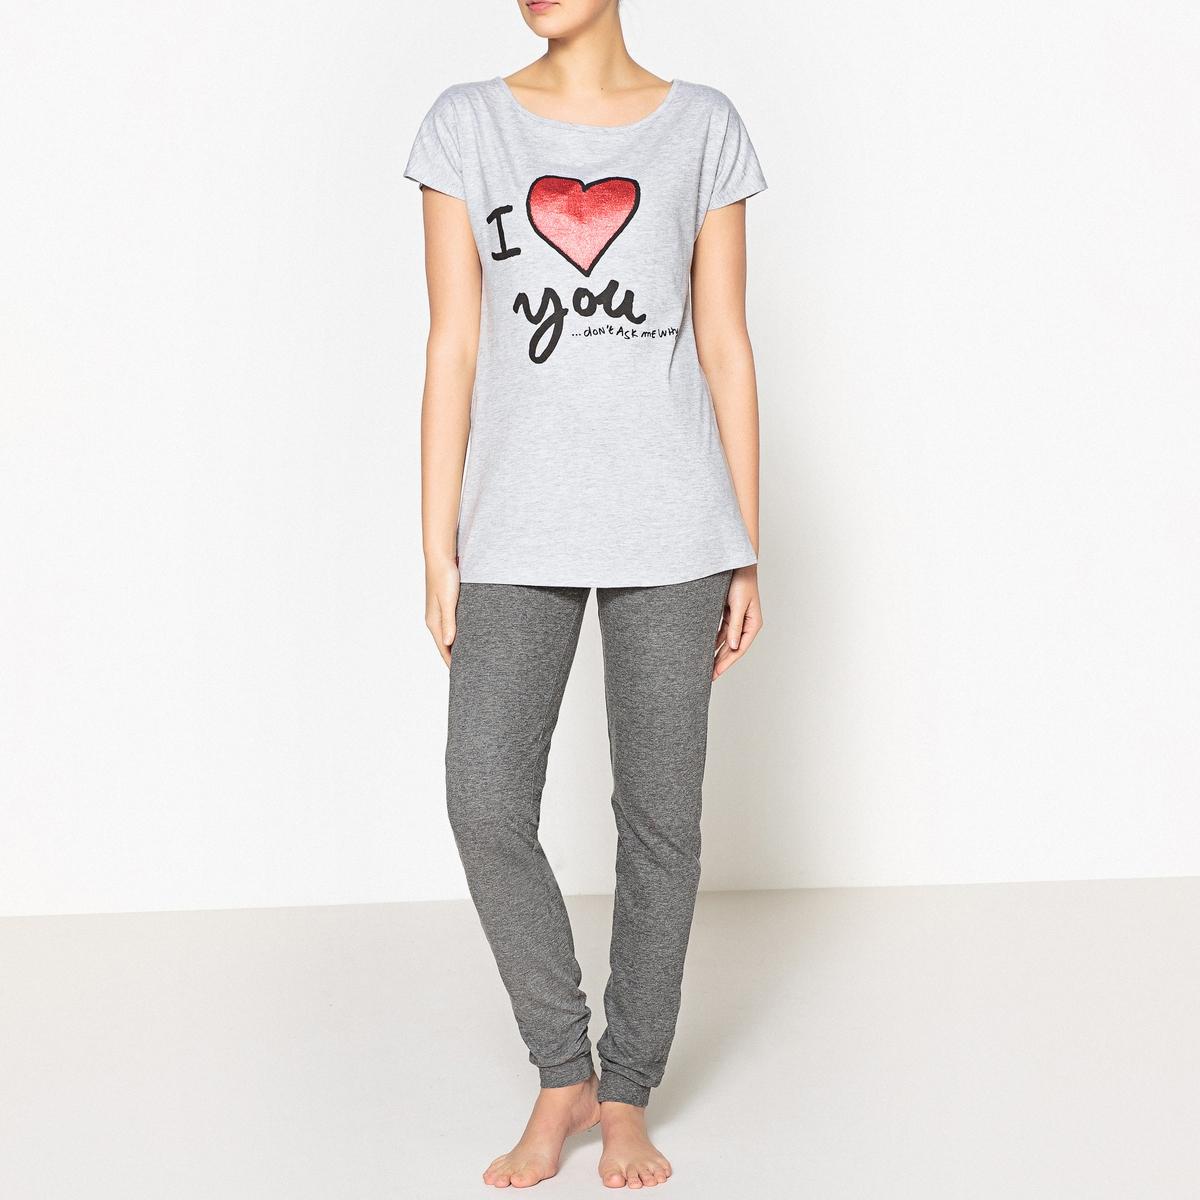 Пижама из 2 изделий с рисунком, Lovelies пижама с шортами с рисунком